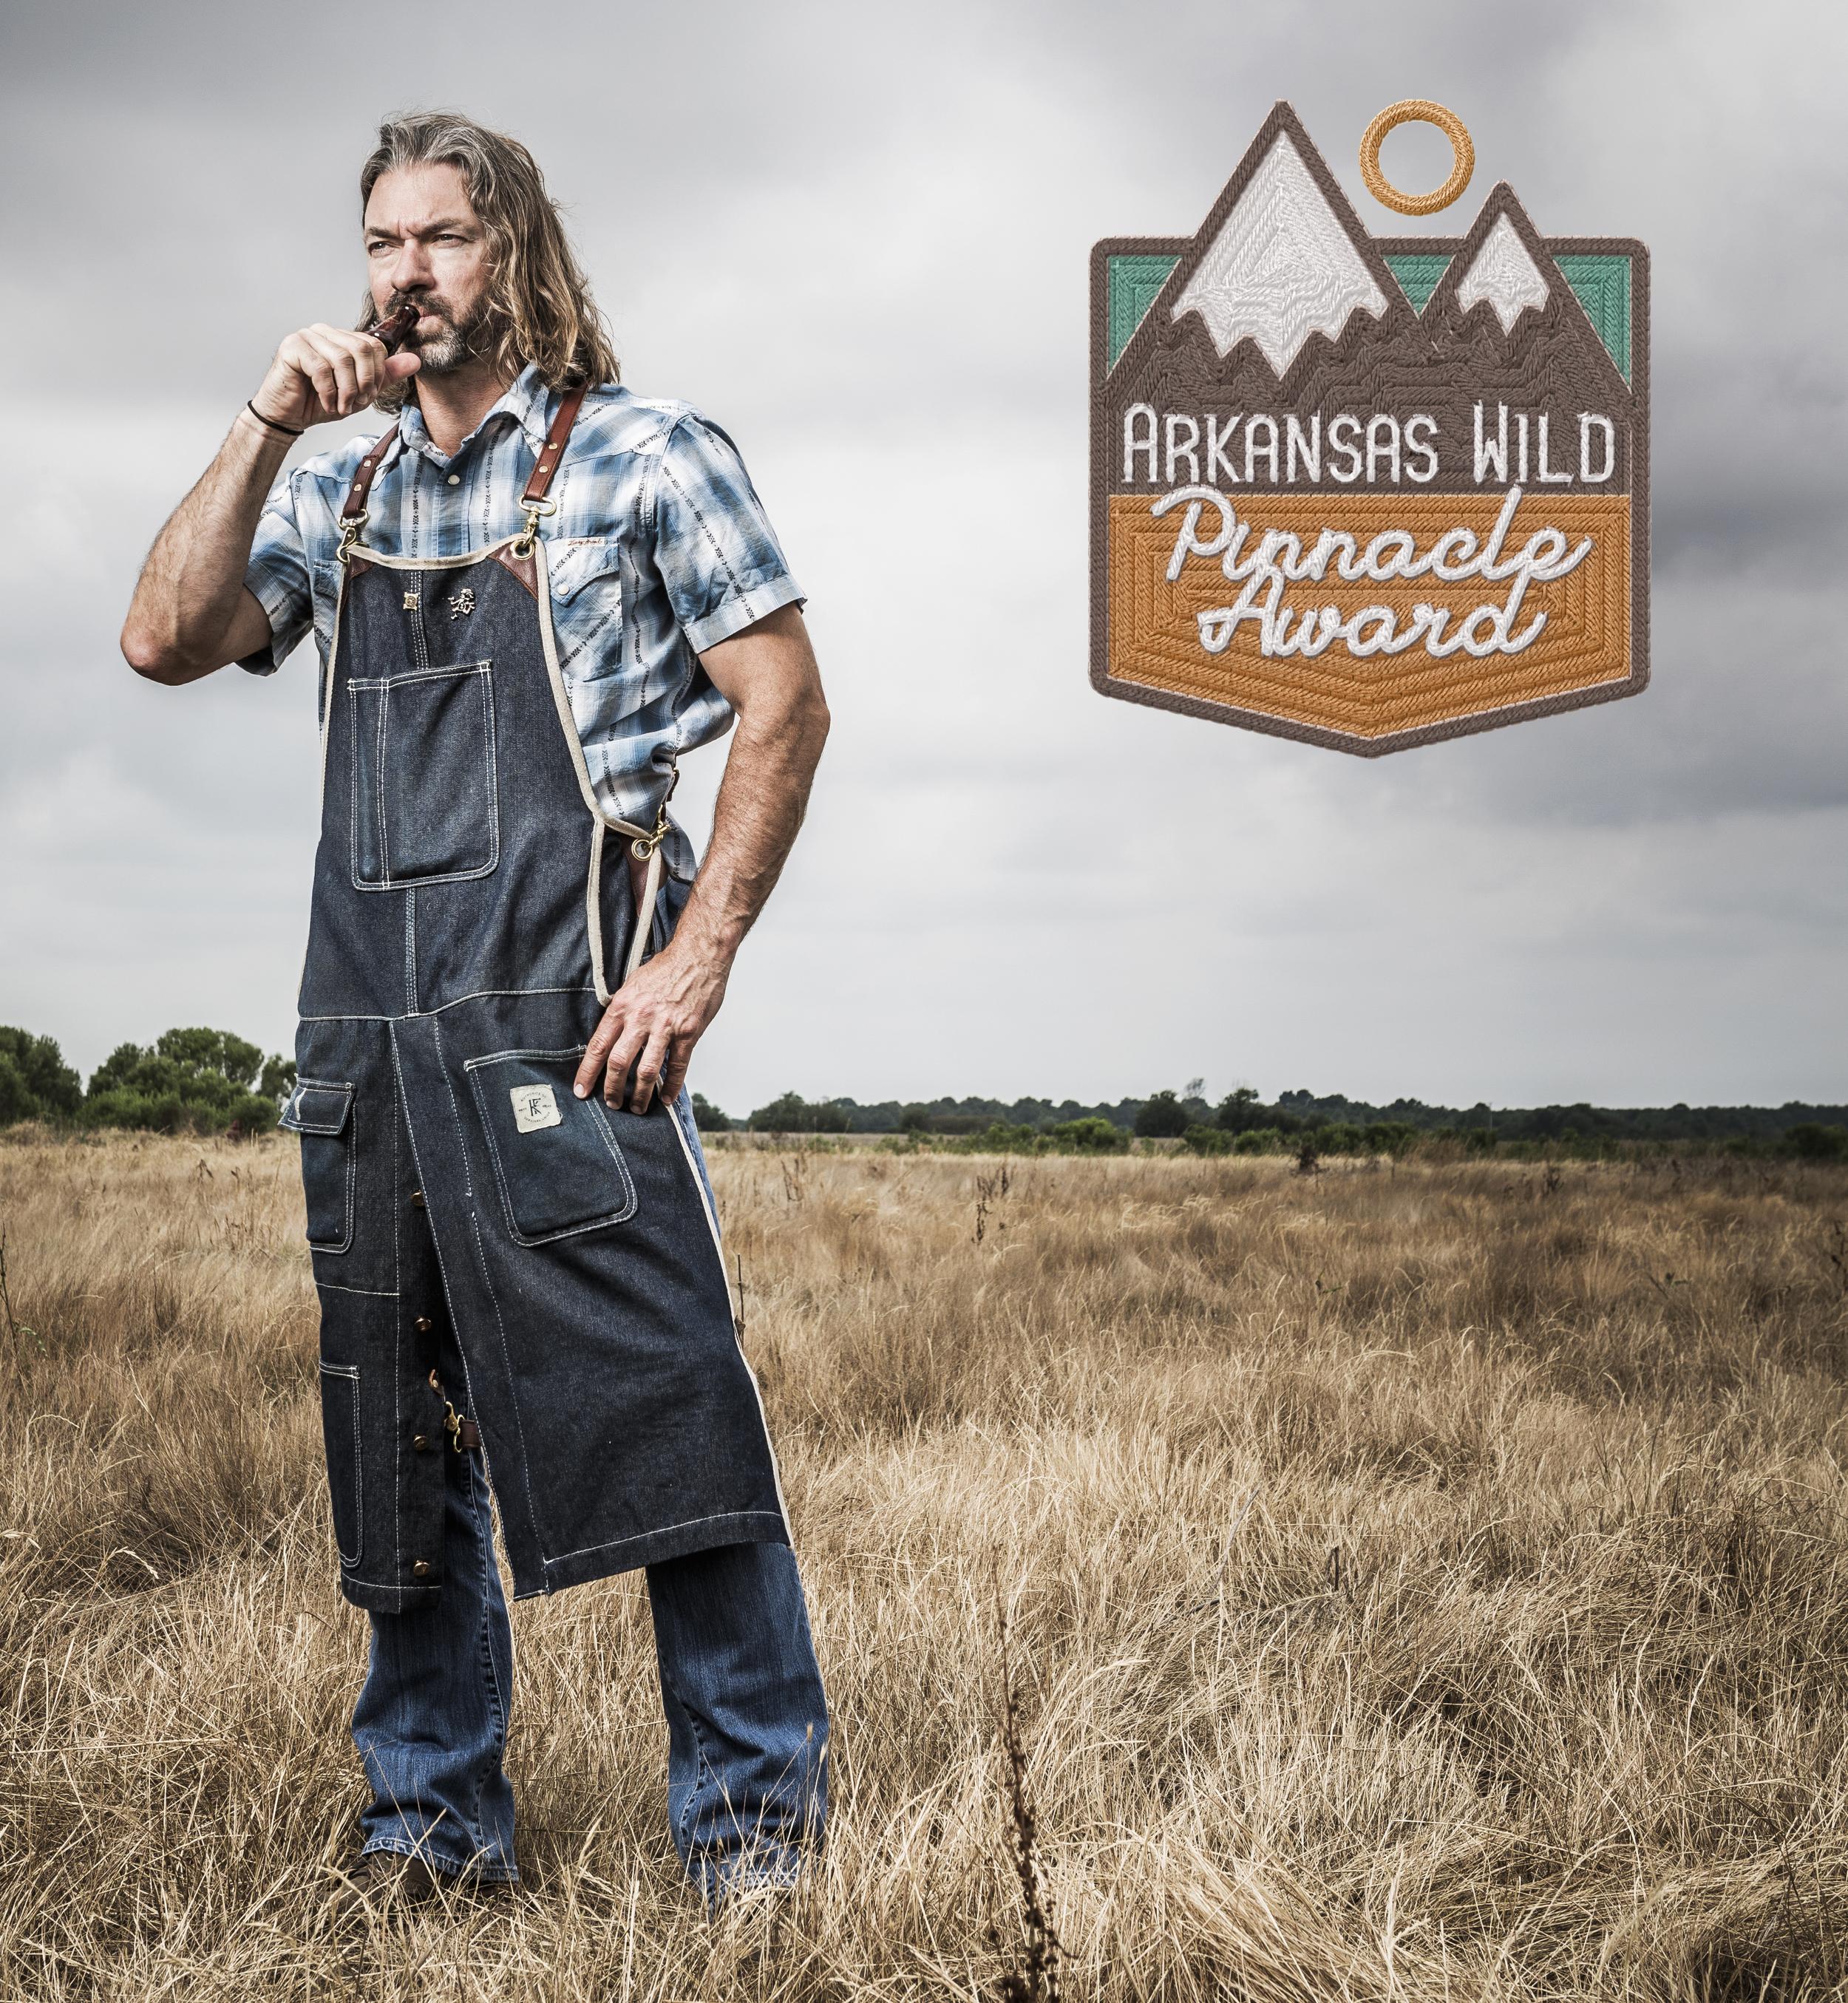 Meet Pinnacle Award recipient for favorite duck call John Stephens of RNT calls.